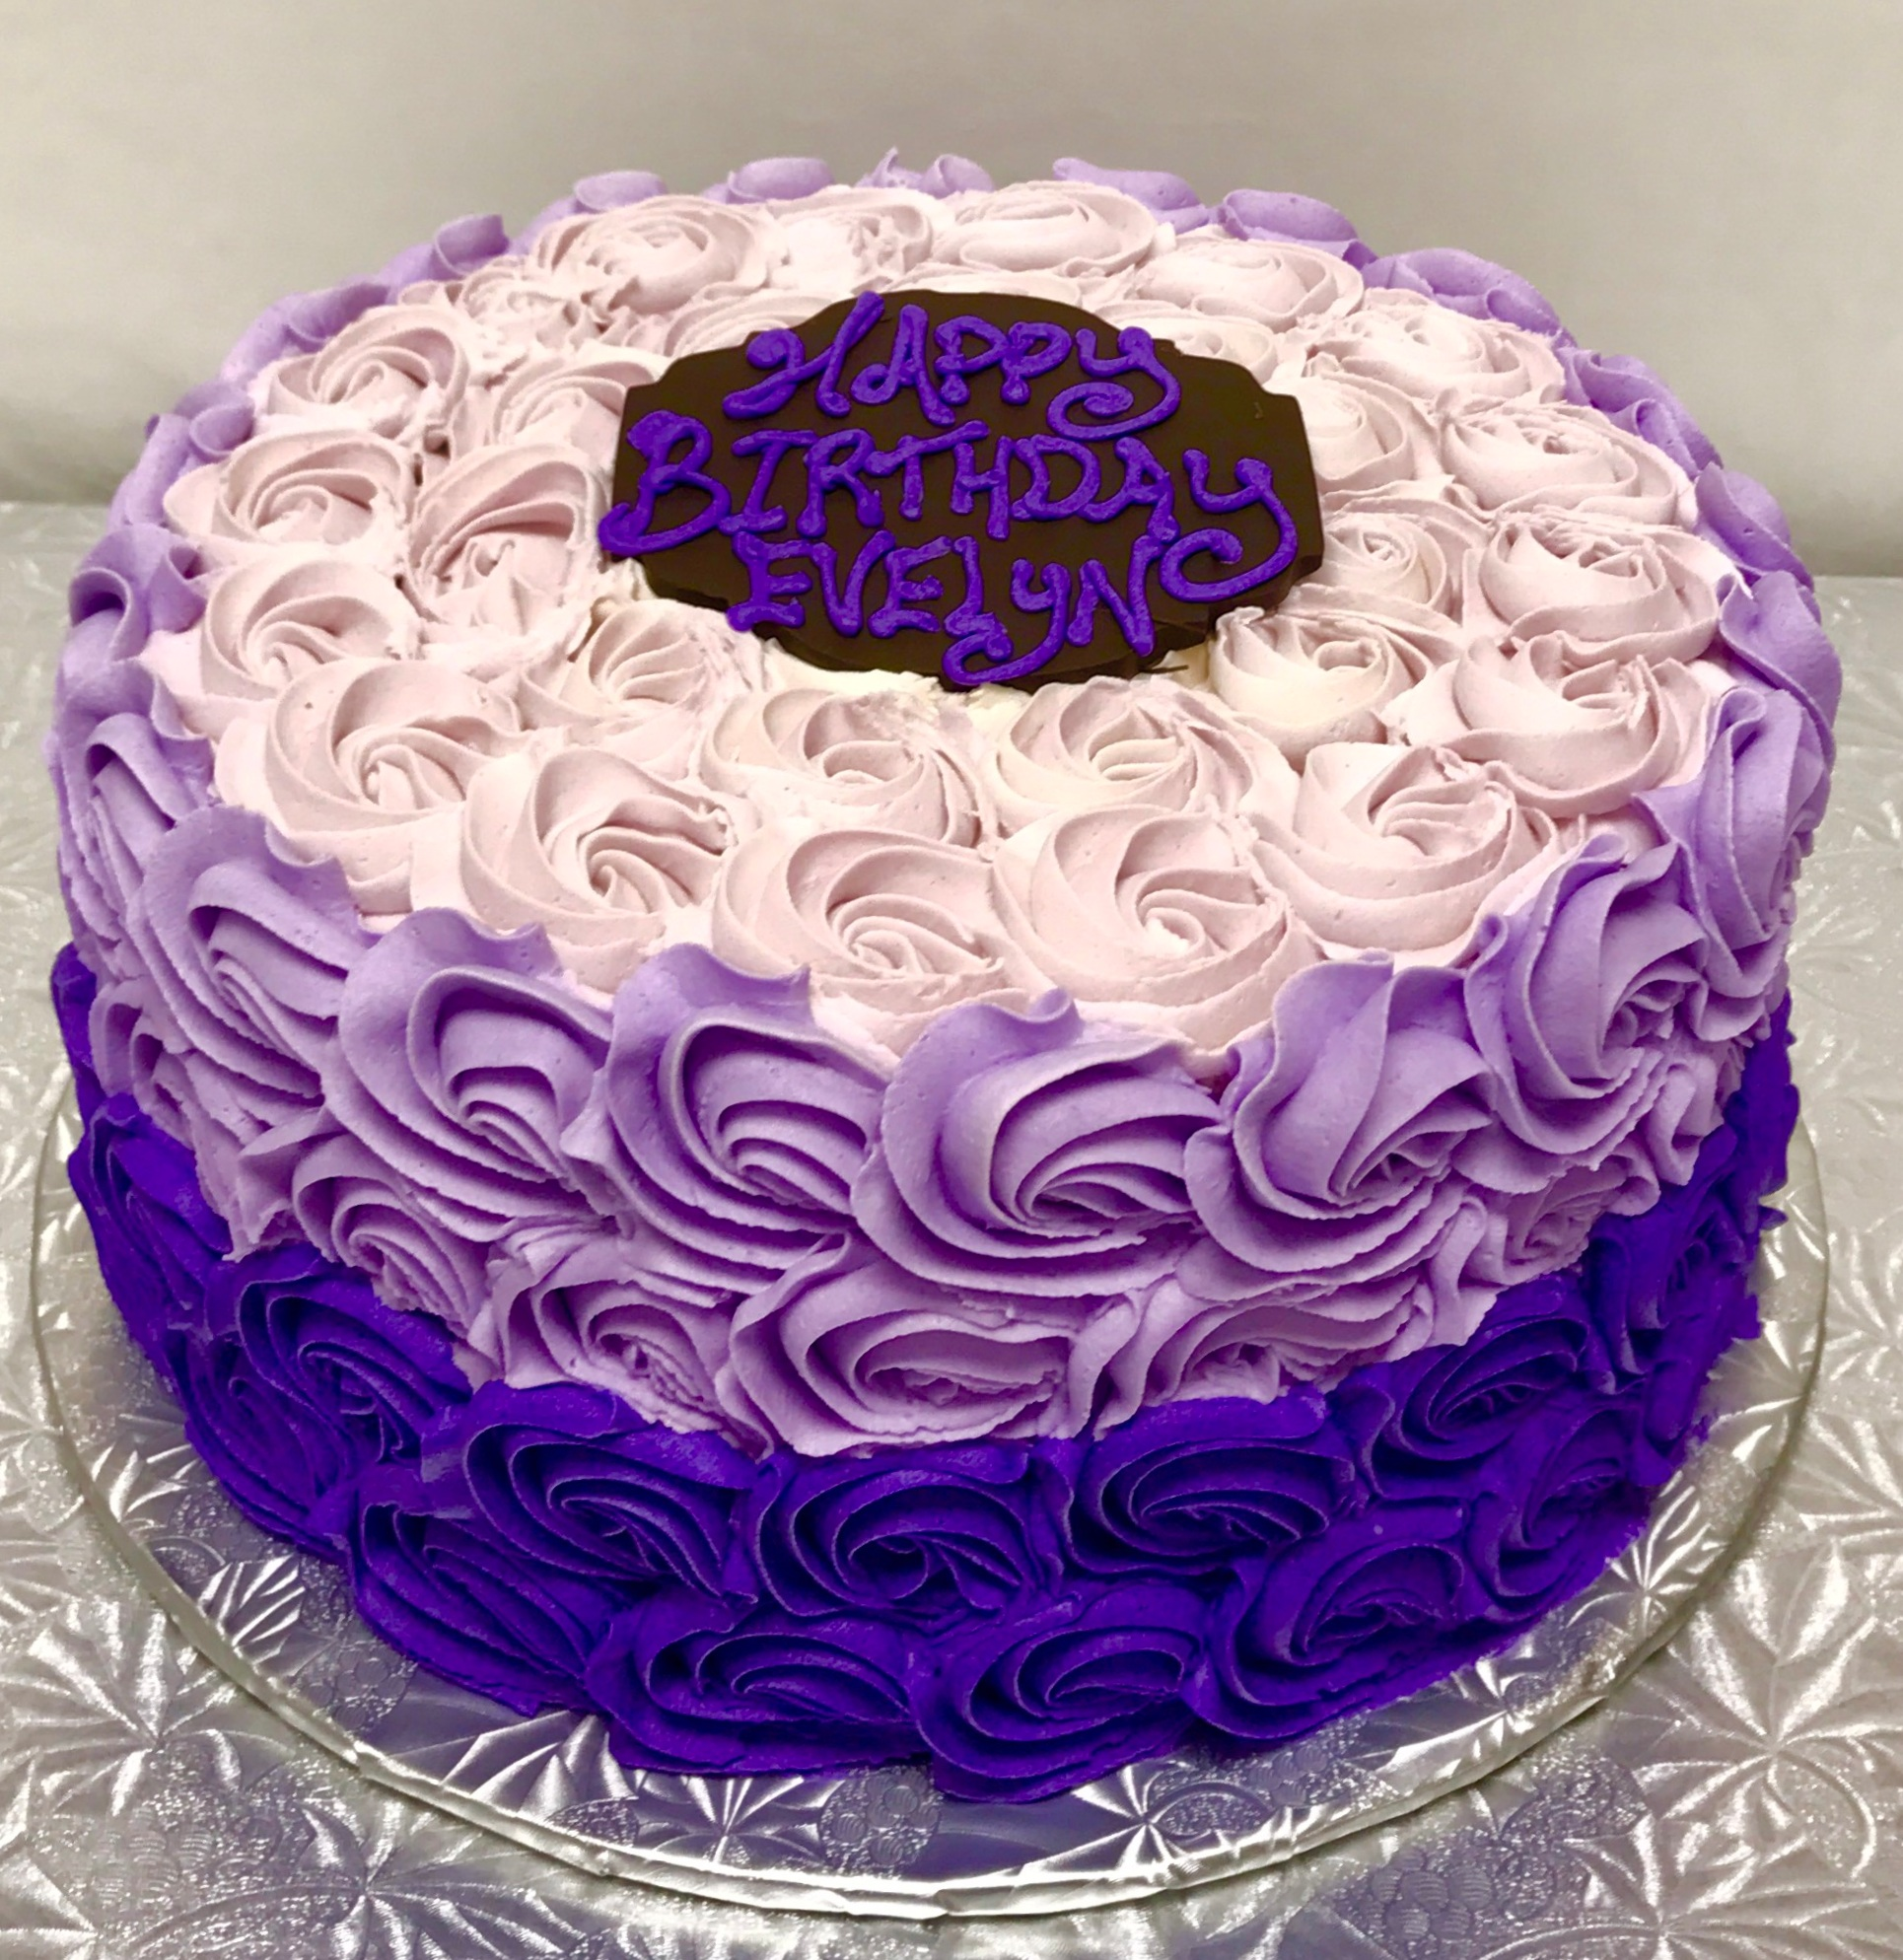 "- 6"" cake serves 8 - 12 people ($30)8"" cake serves 14 - 20 people ($45)10"" cake serves 22 - 30 people ($59)12"" cake serves 34 - 50 people ($80)14"" cake serves 50 - 75 people ($110)"